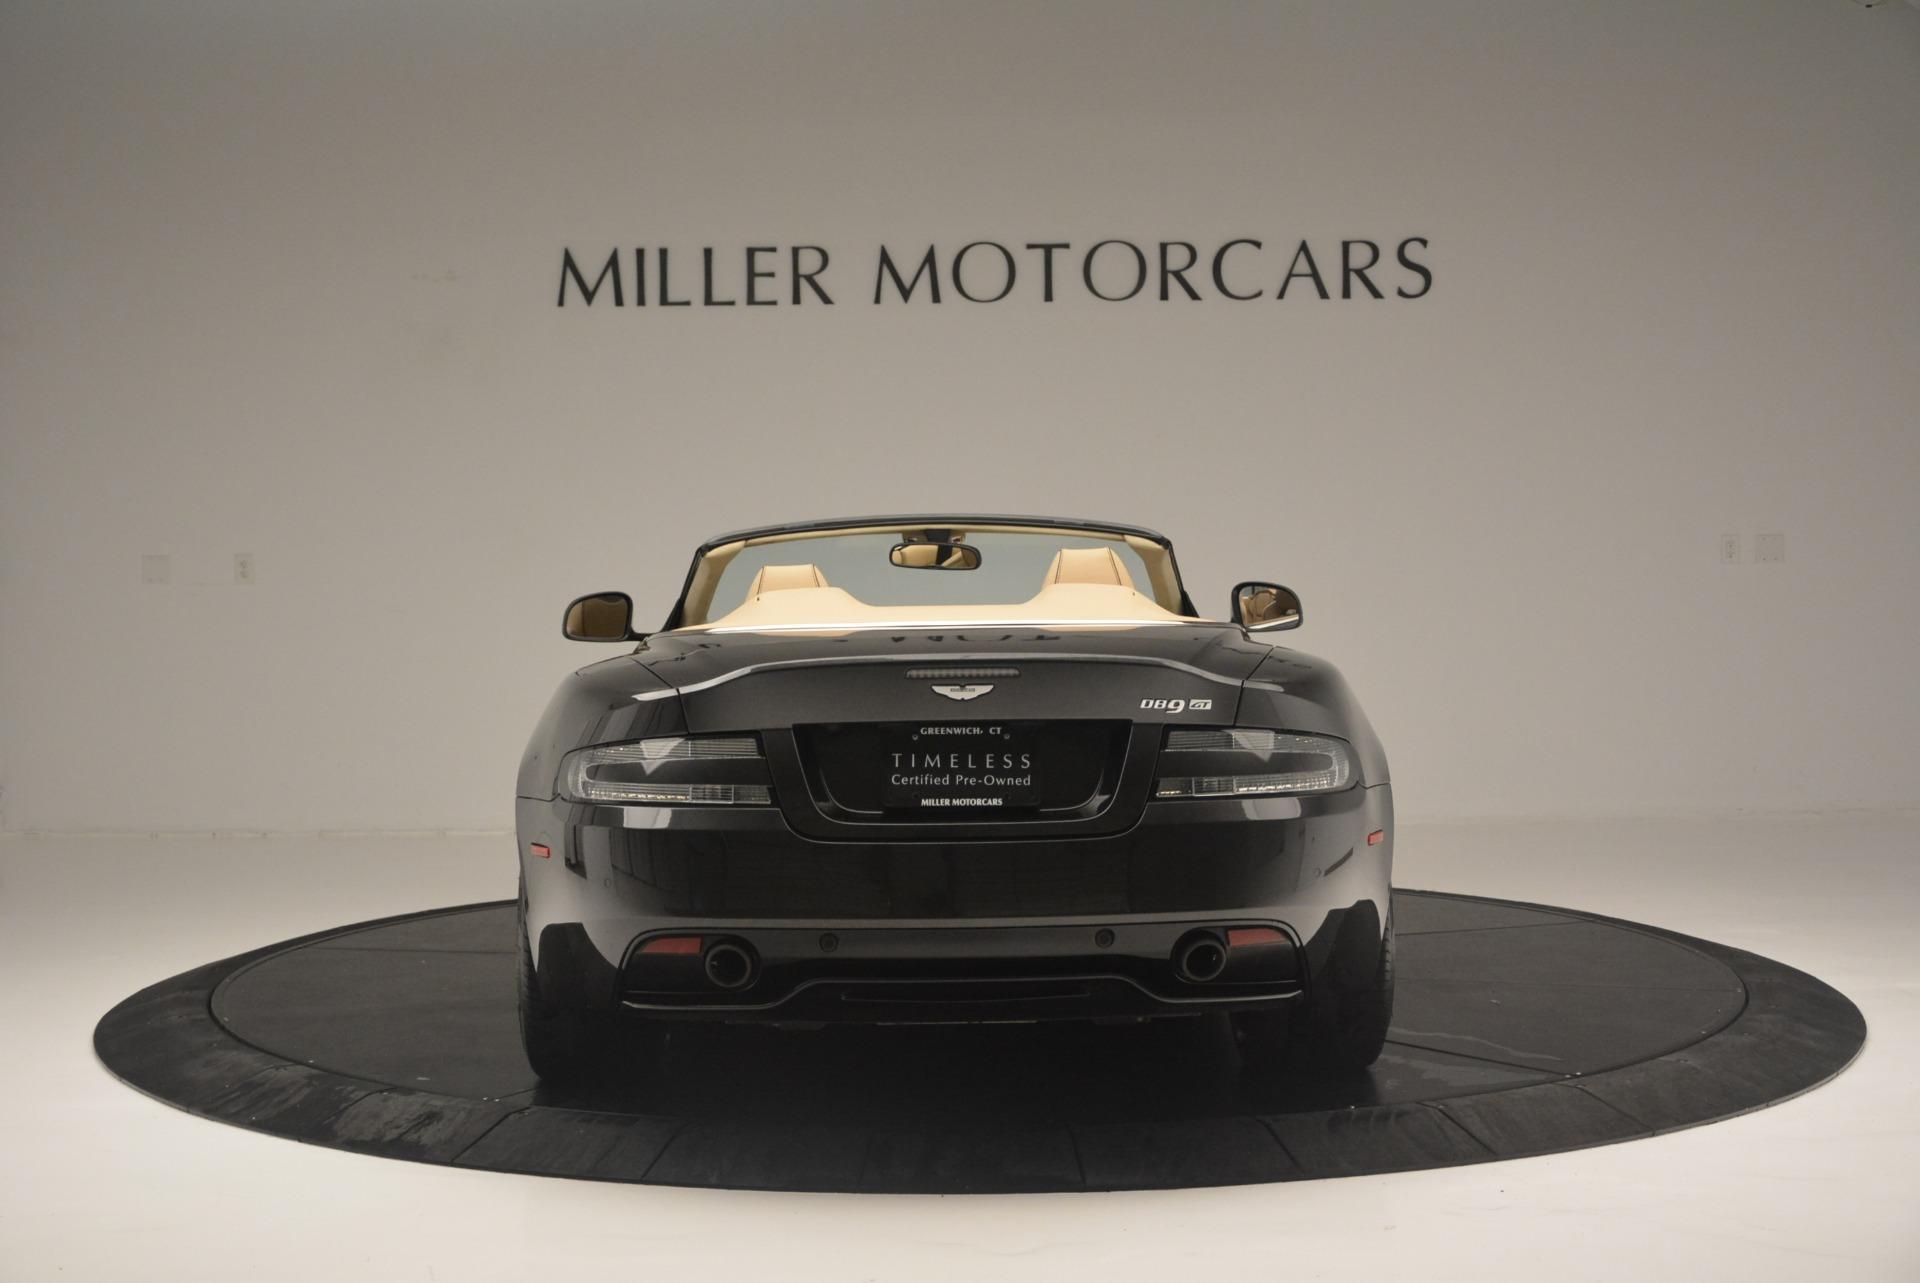 Used 2016 Aston Martin DB9 GT Volante For Sale In Greenwich, CT 2429_p6